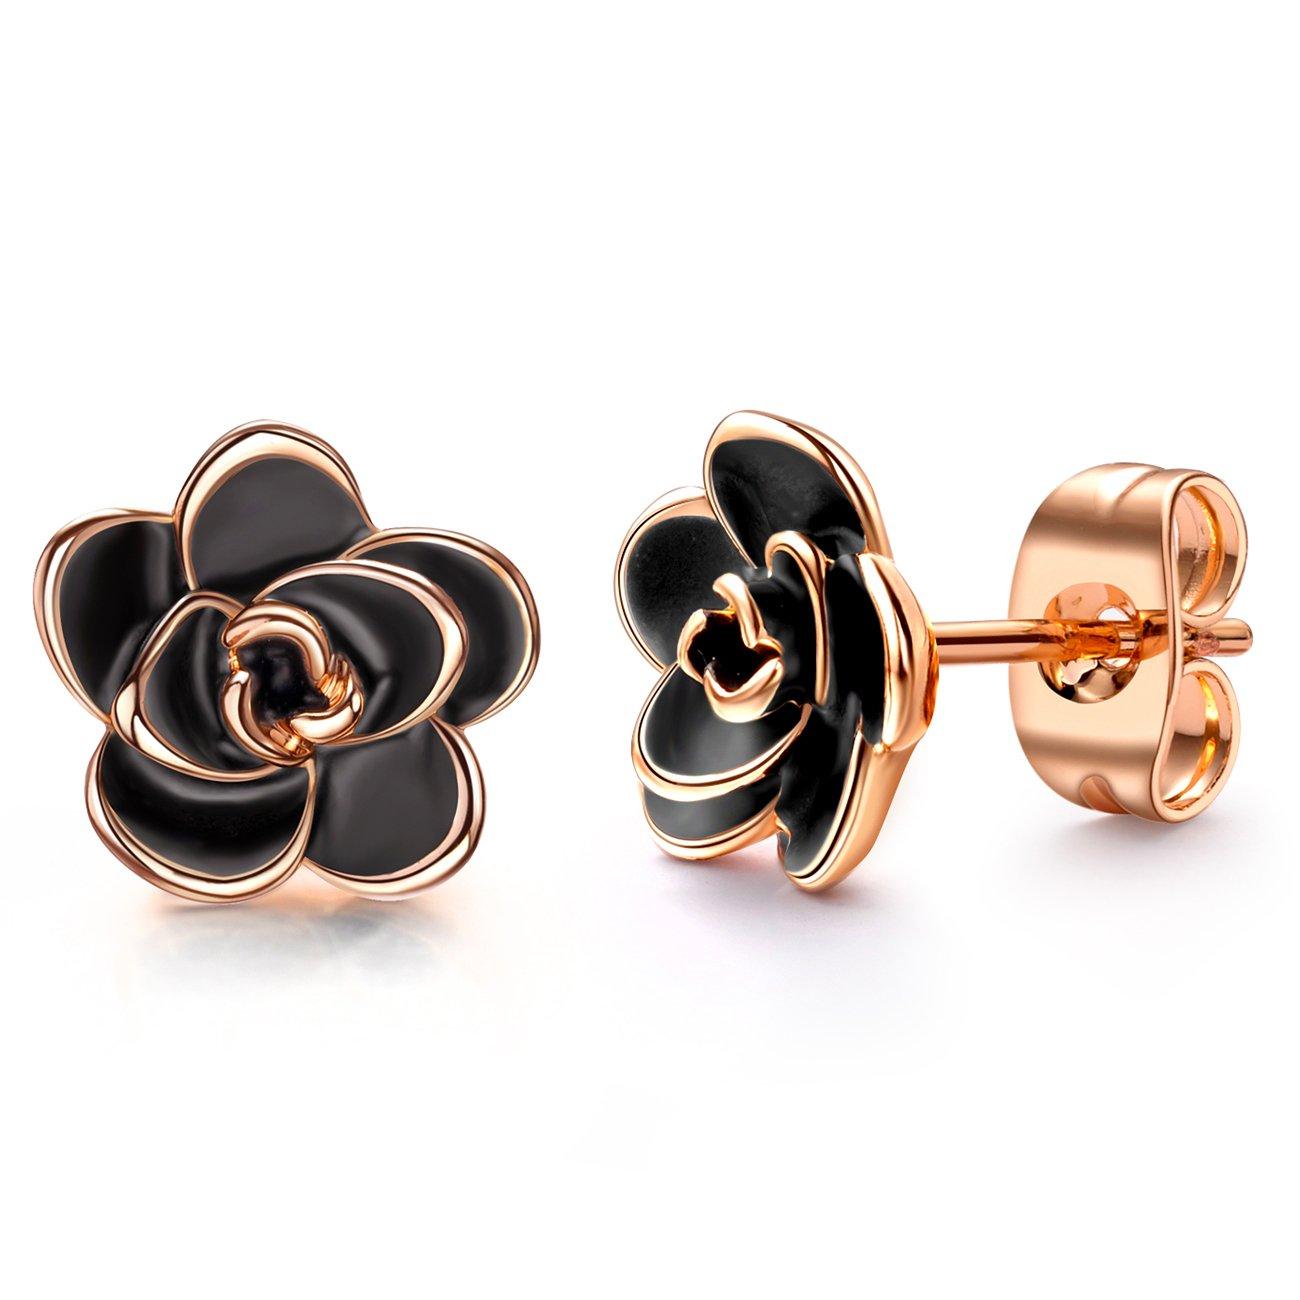 AllenCOCO 18K Gold Plated Black Rose Flower Stud Earrings for Women B01MRFKW7U_US